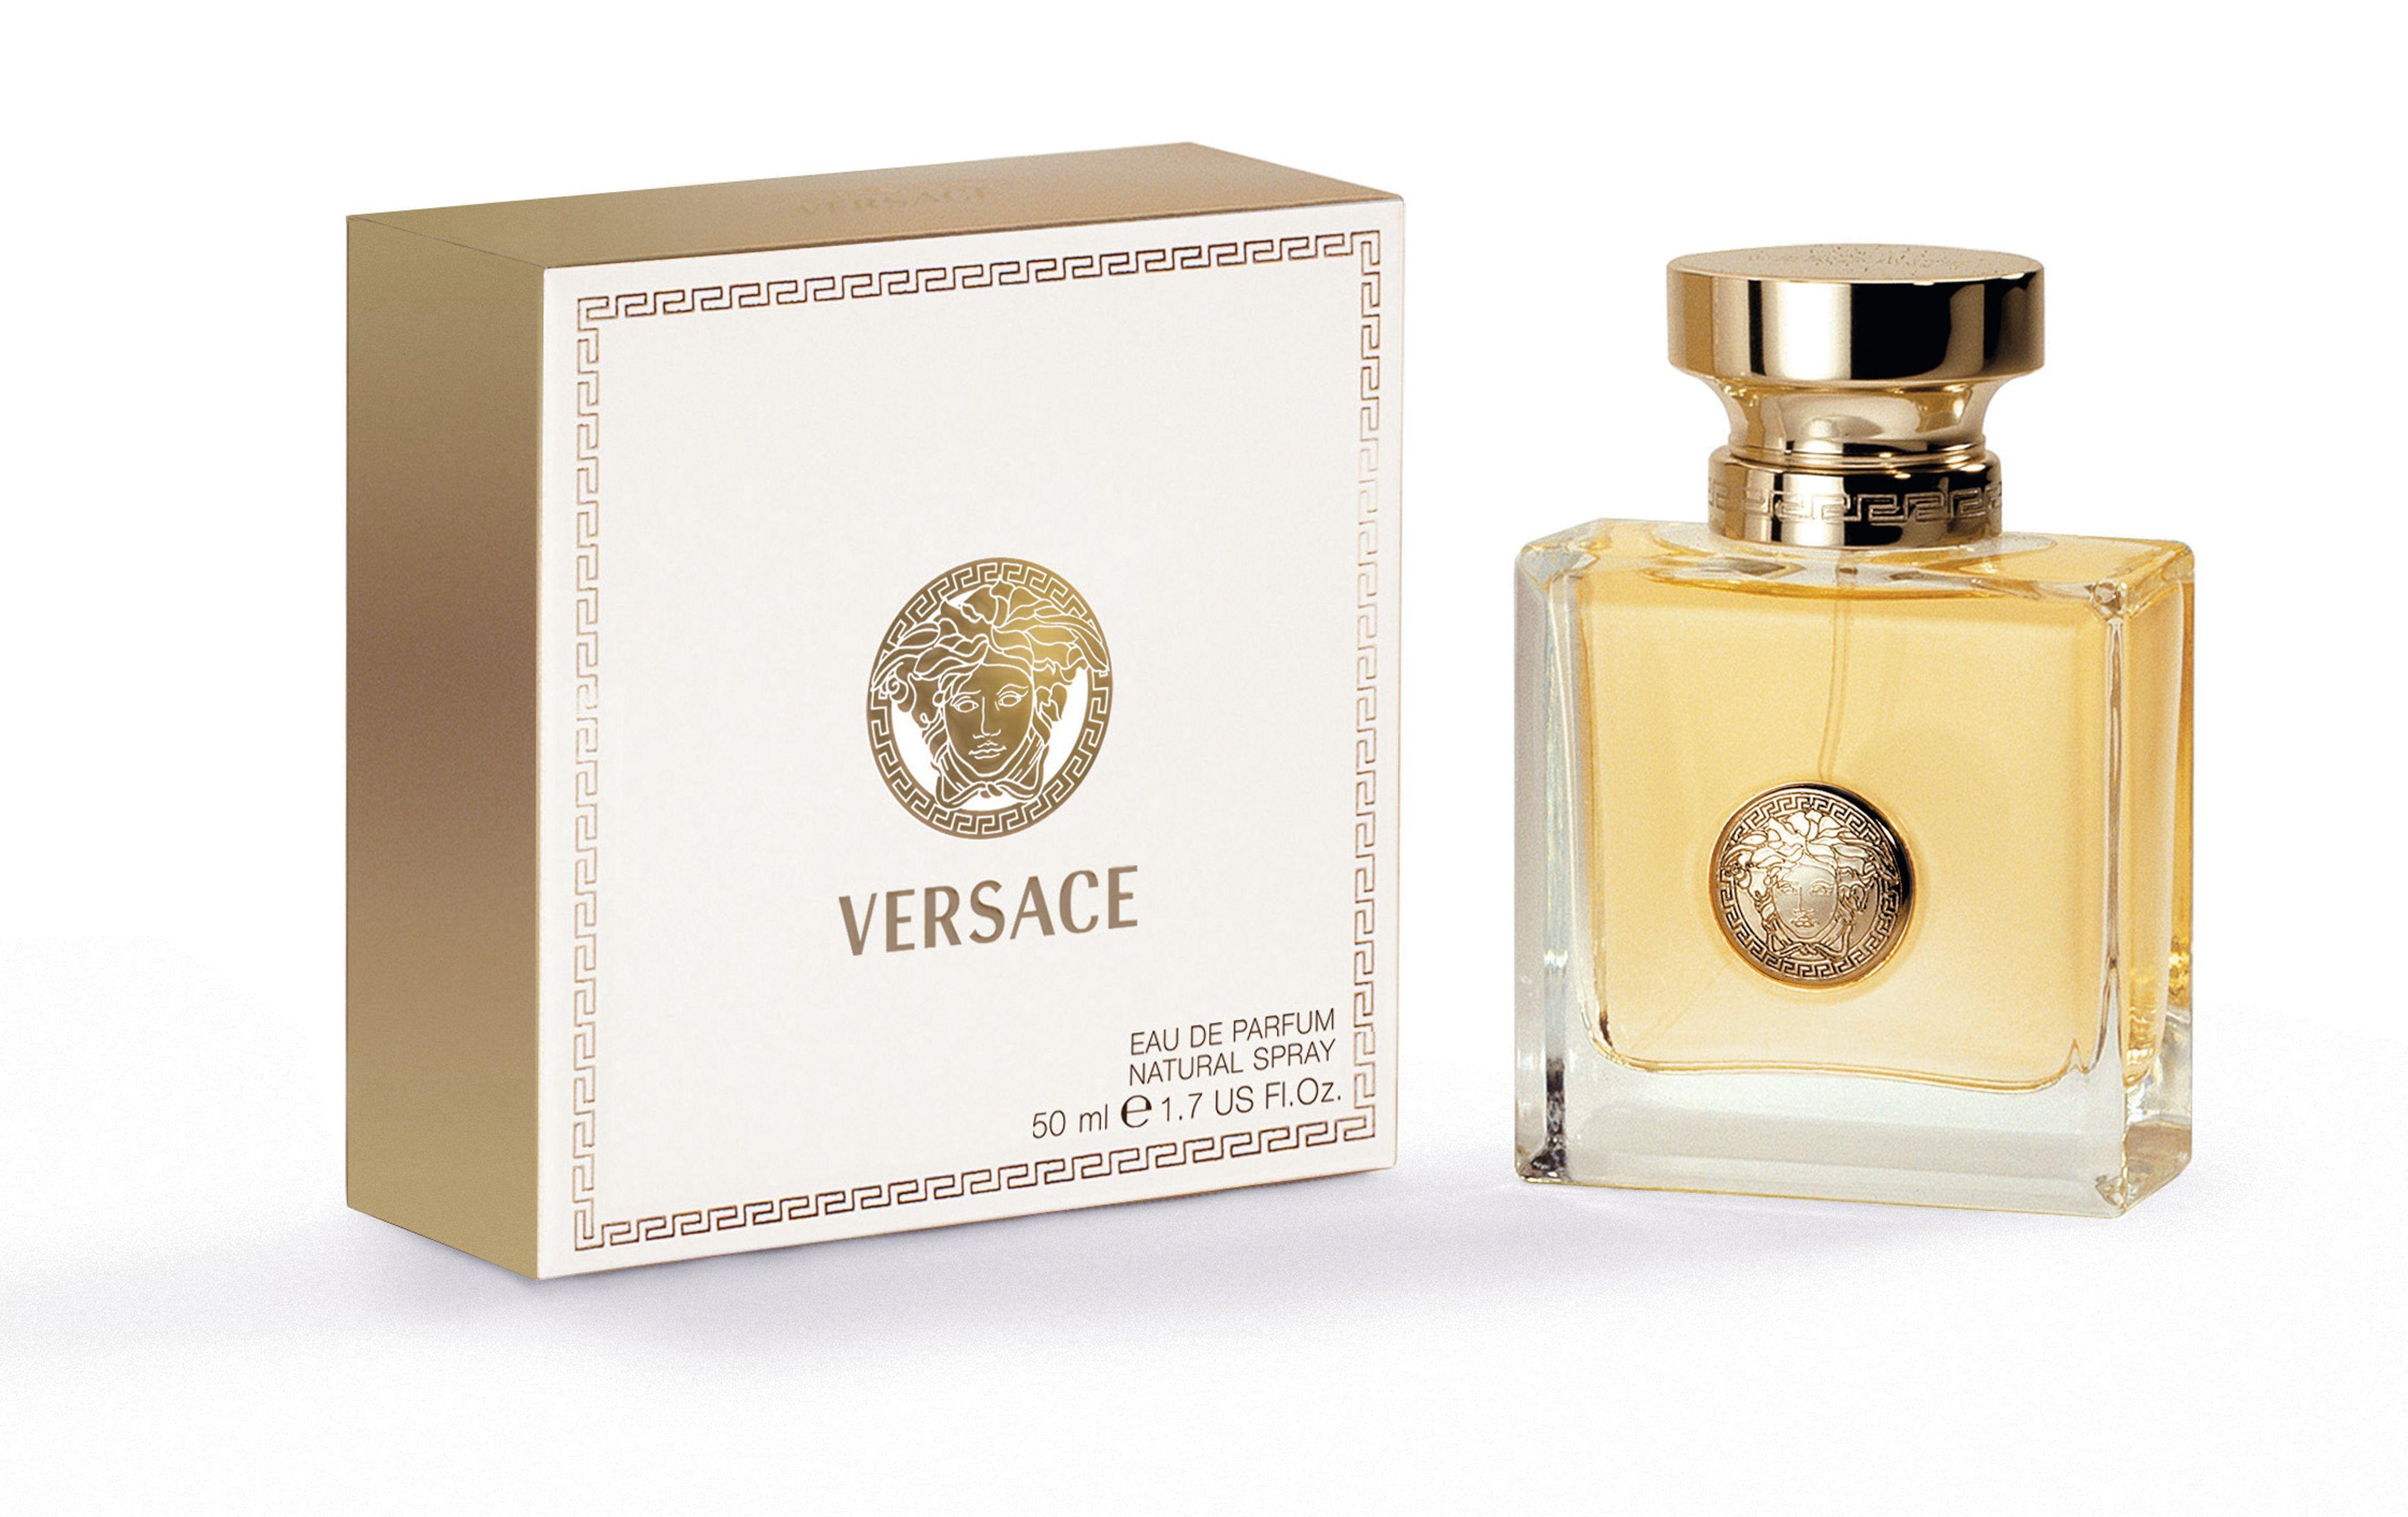 Parfum PerfumePour Femme First Eau De 100ml Versace lFT1JcK